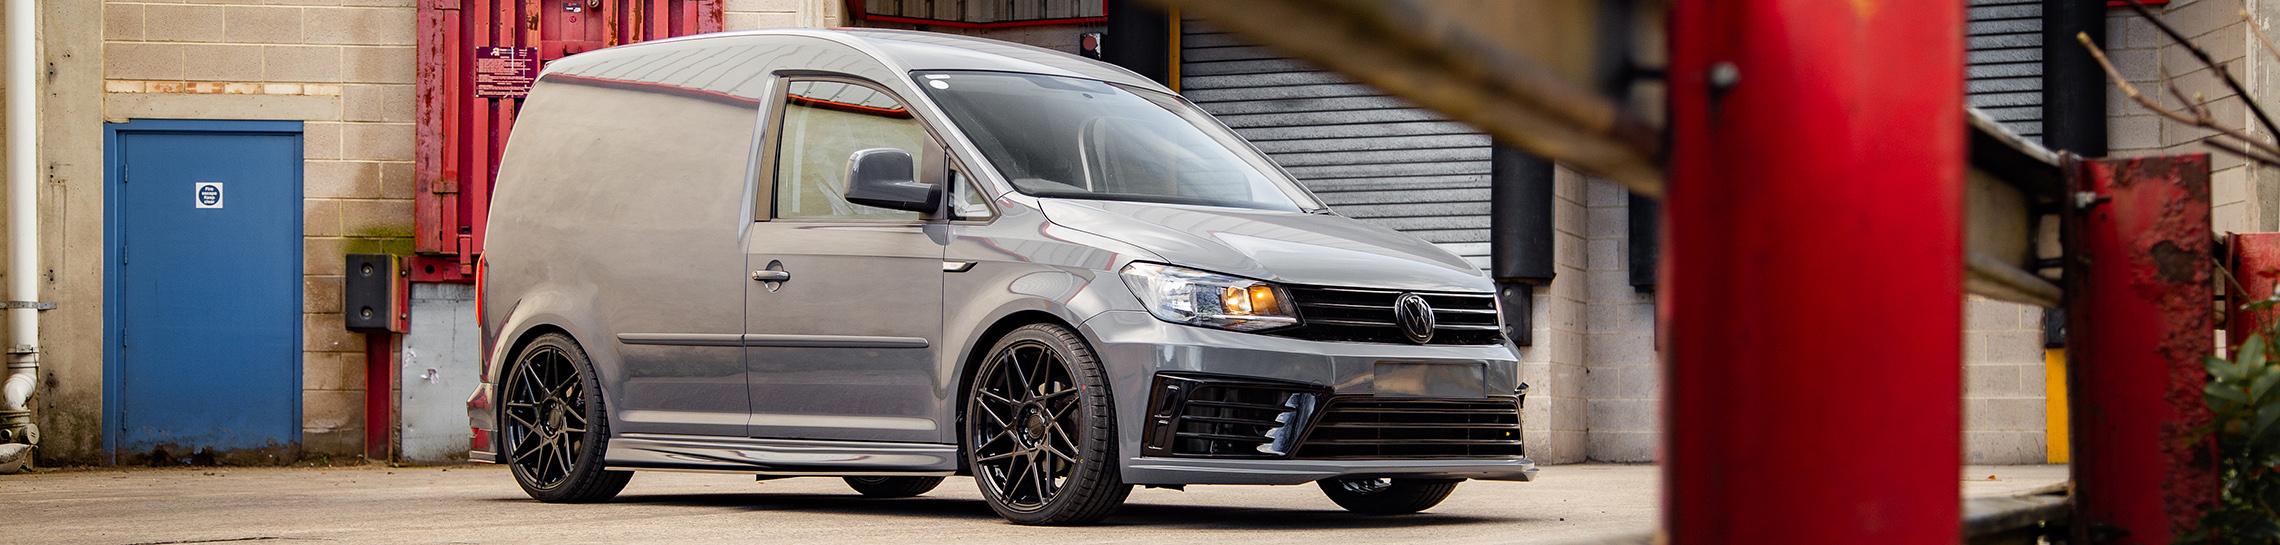 Nardo Grey Volkswagen Caddy with Riviera RF2 Hubolt Flow Formed Alloy Wheels